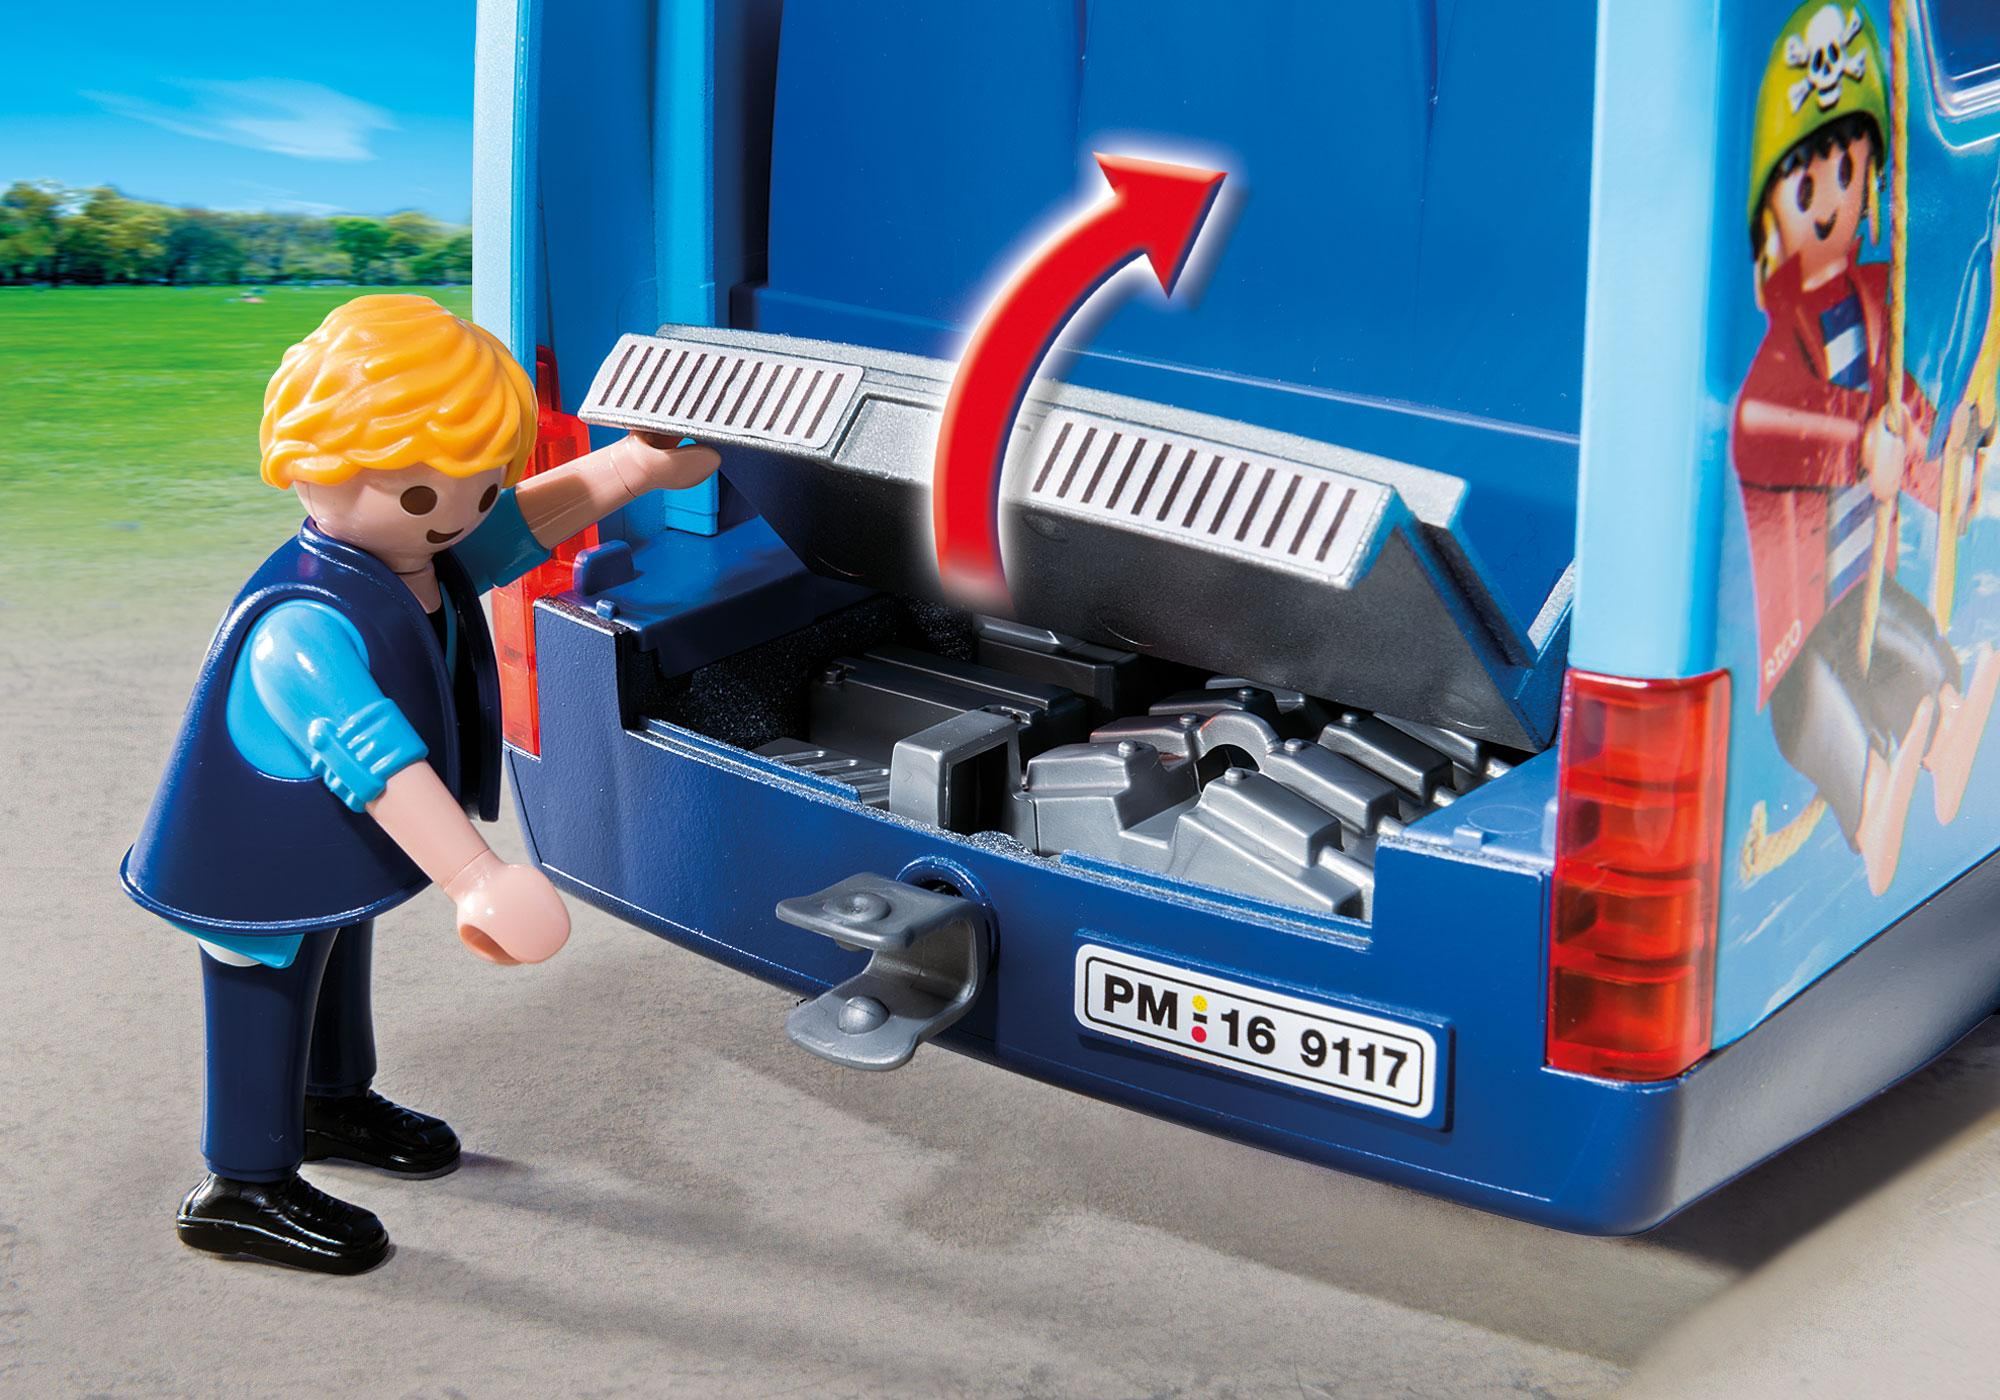 http://media.playmobil.com/i/playmobil/9117_product_extra4/PLAYMOBIL-FunPark Bus